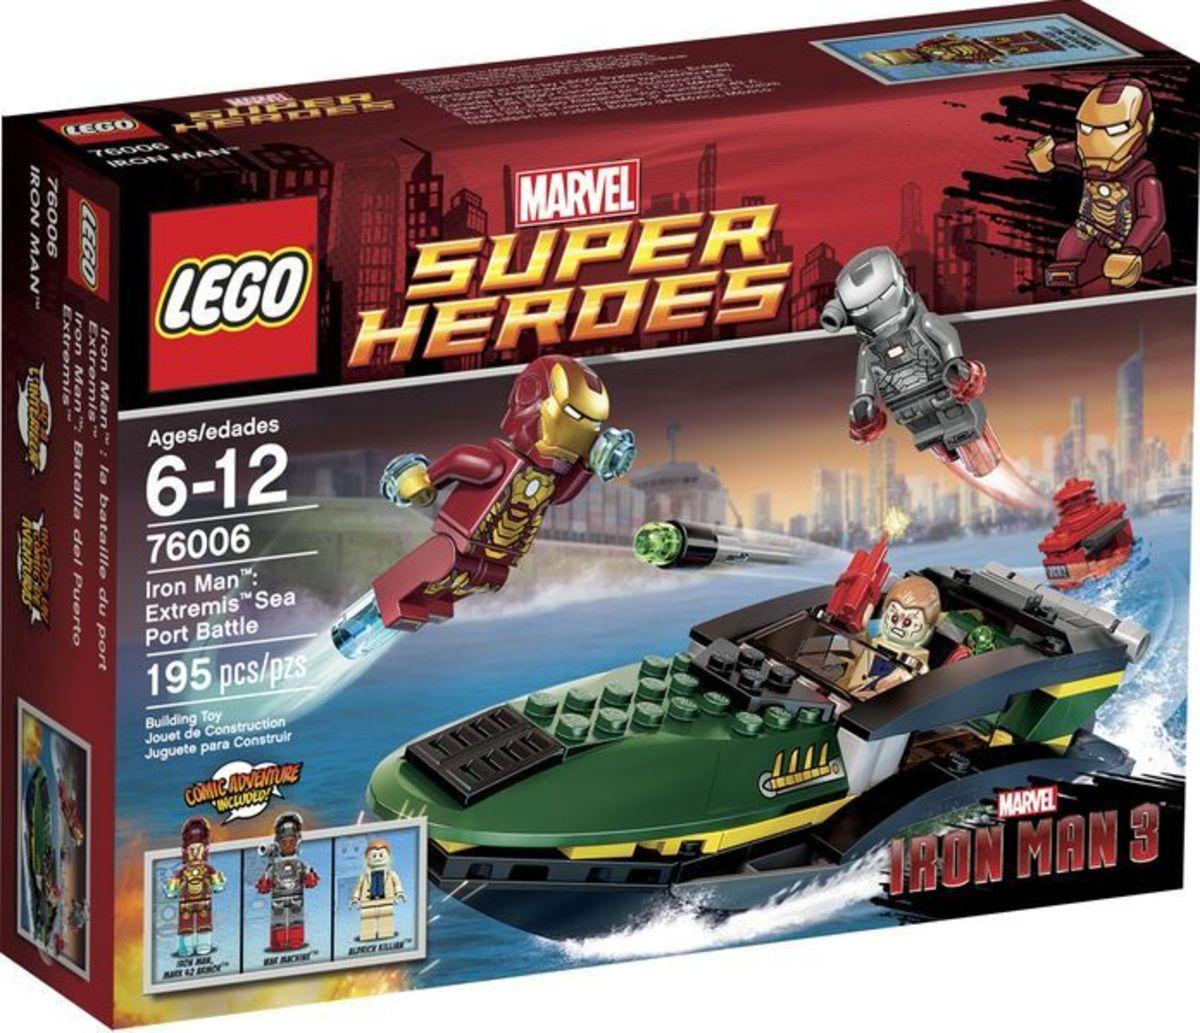 LEGO Super Heroes Iron Man: Extremis Sea Port Battle 76006 Box